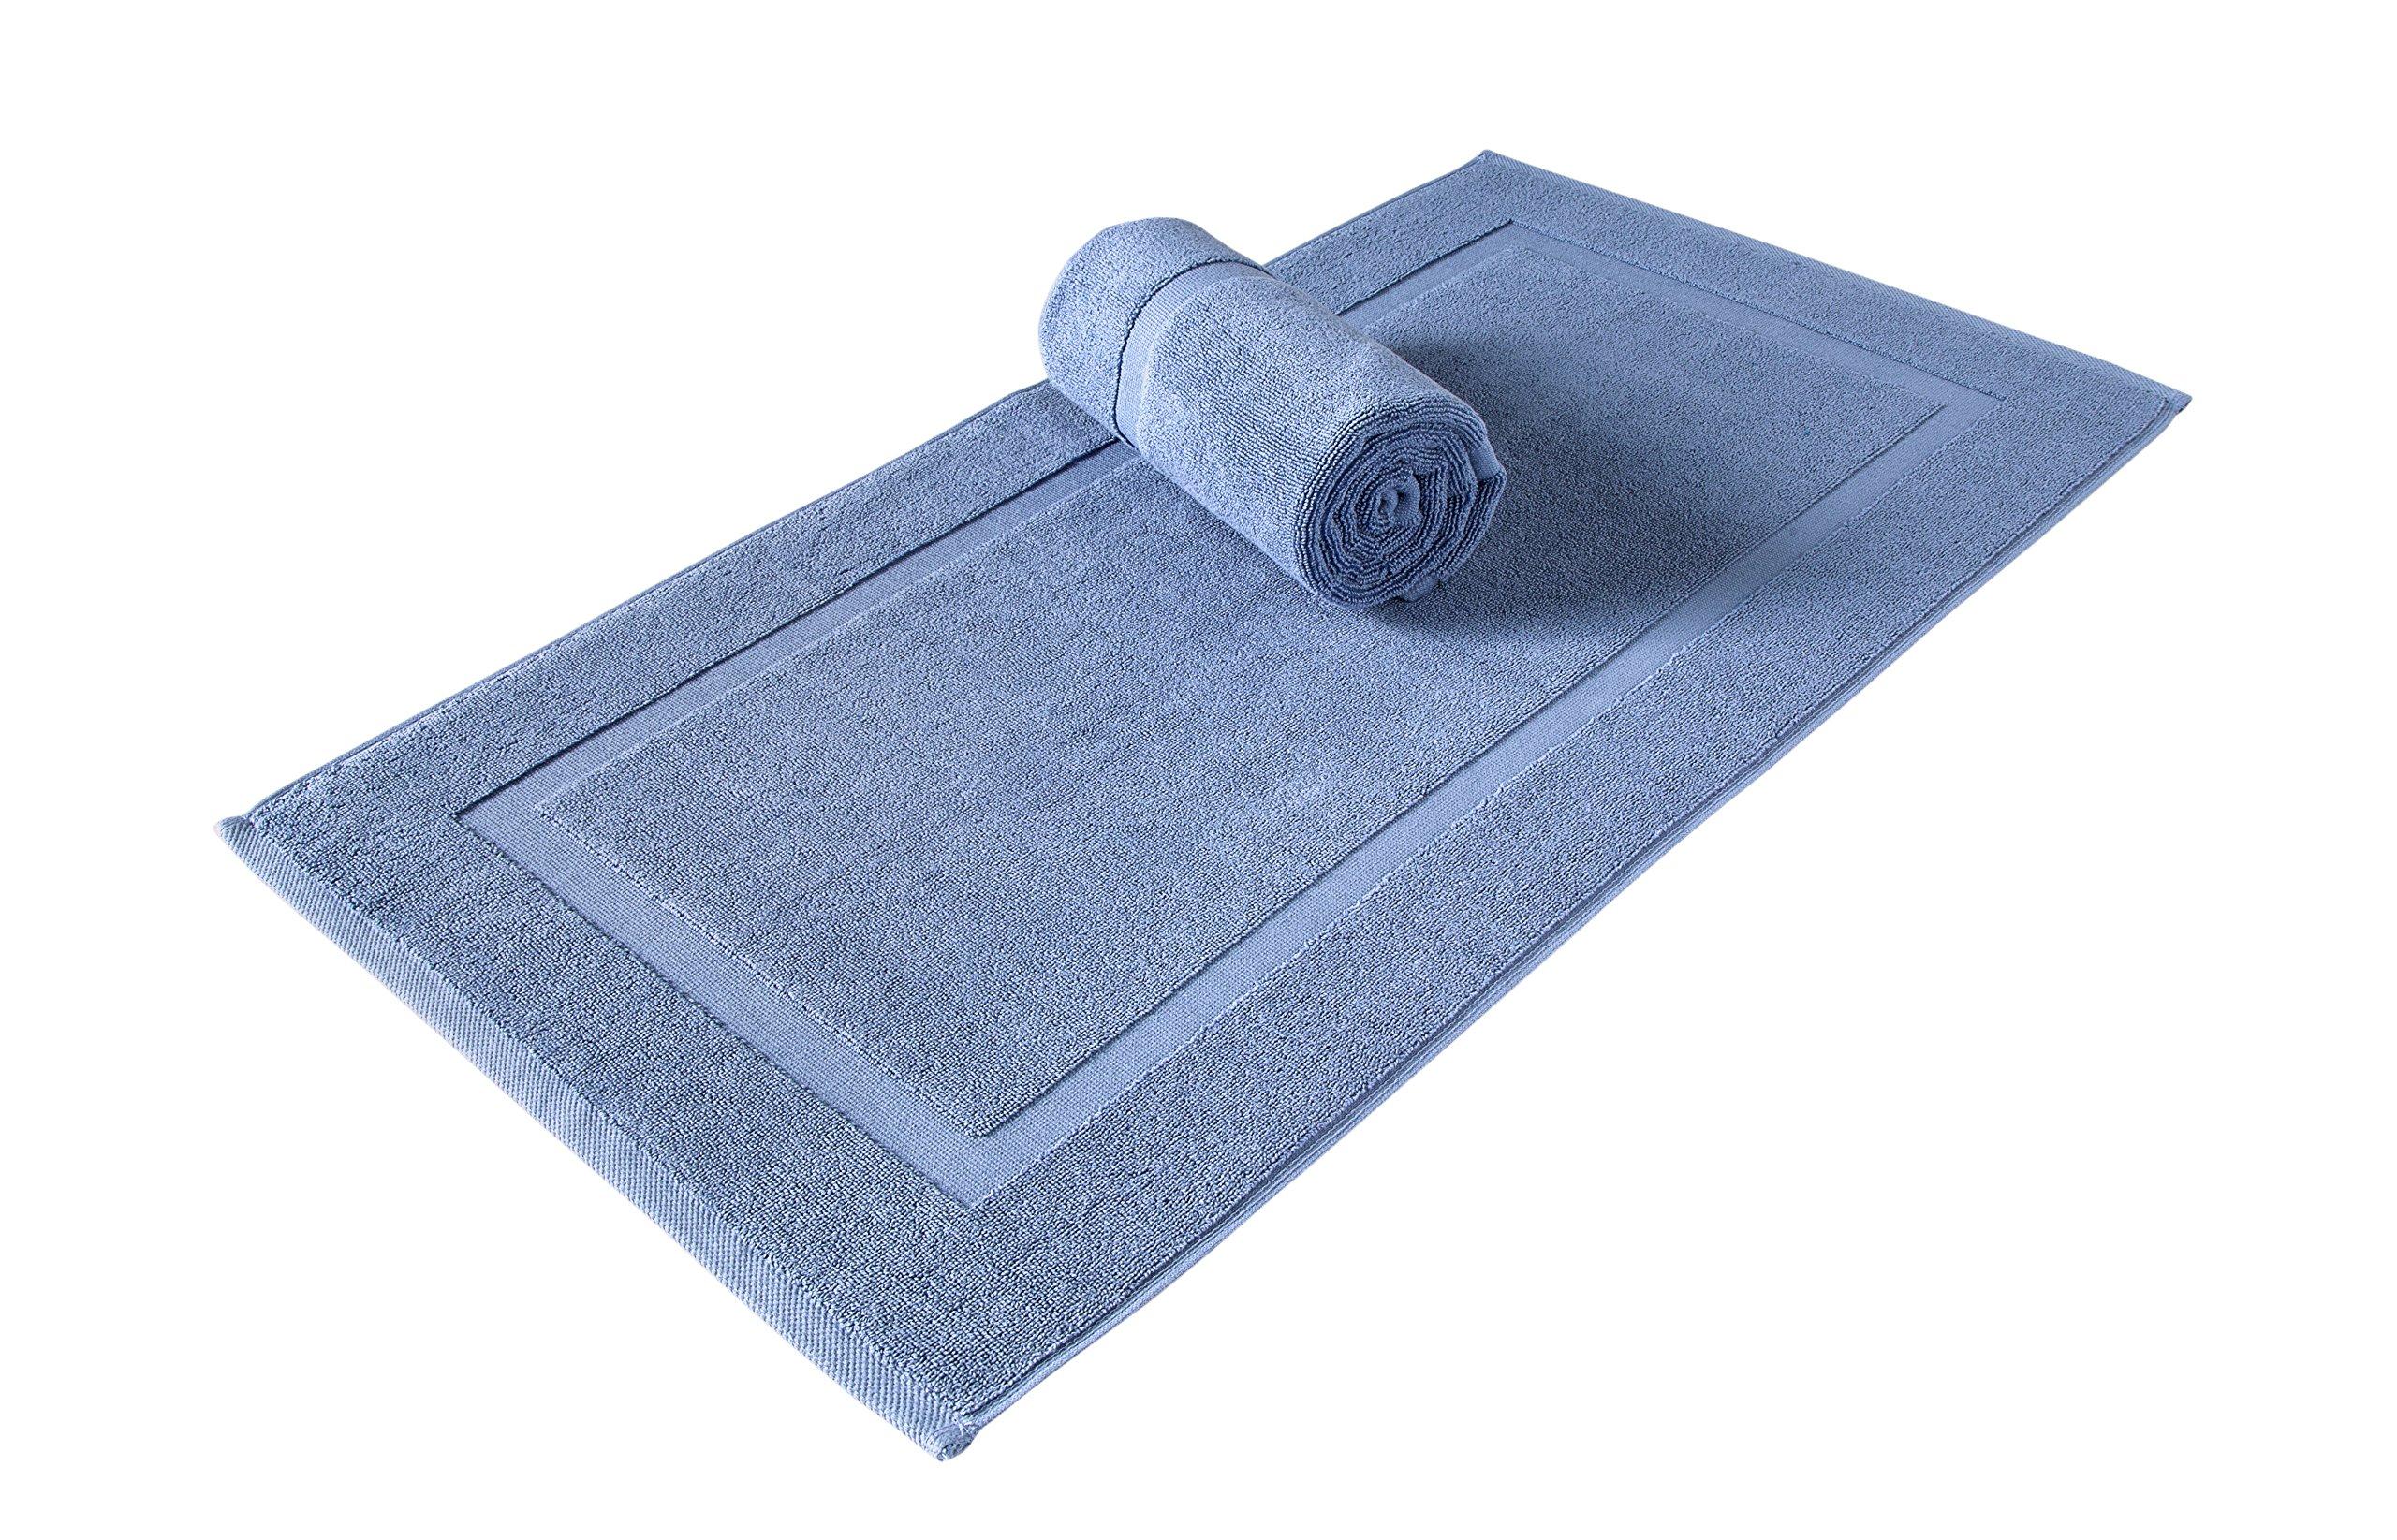 SALBAKOS Luxury Hotel Spa 100% Turkish Cotton Banded Panel Bath Mat Set 900gsm! 20''x34'' (Blue, 2 Pack)